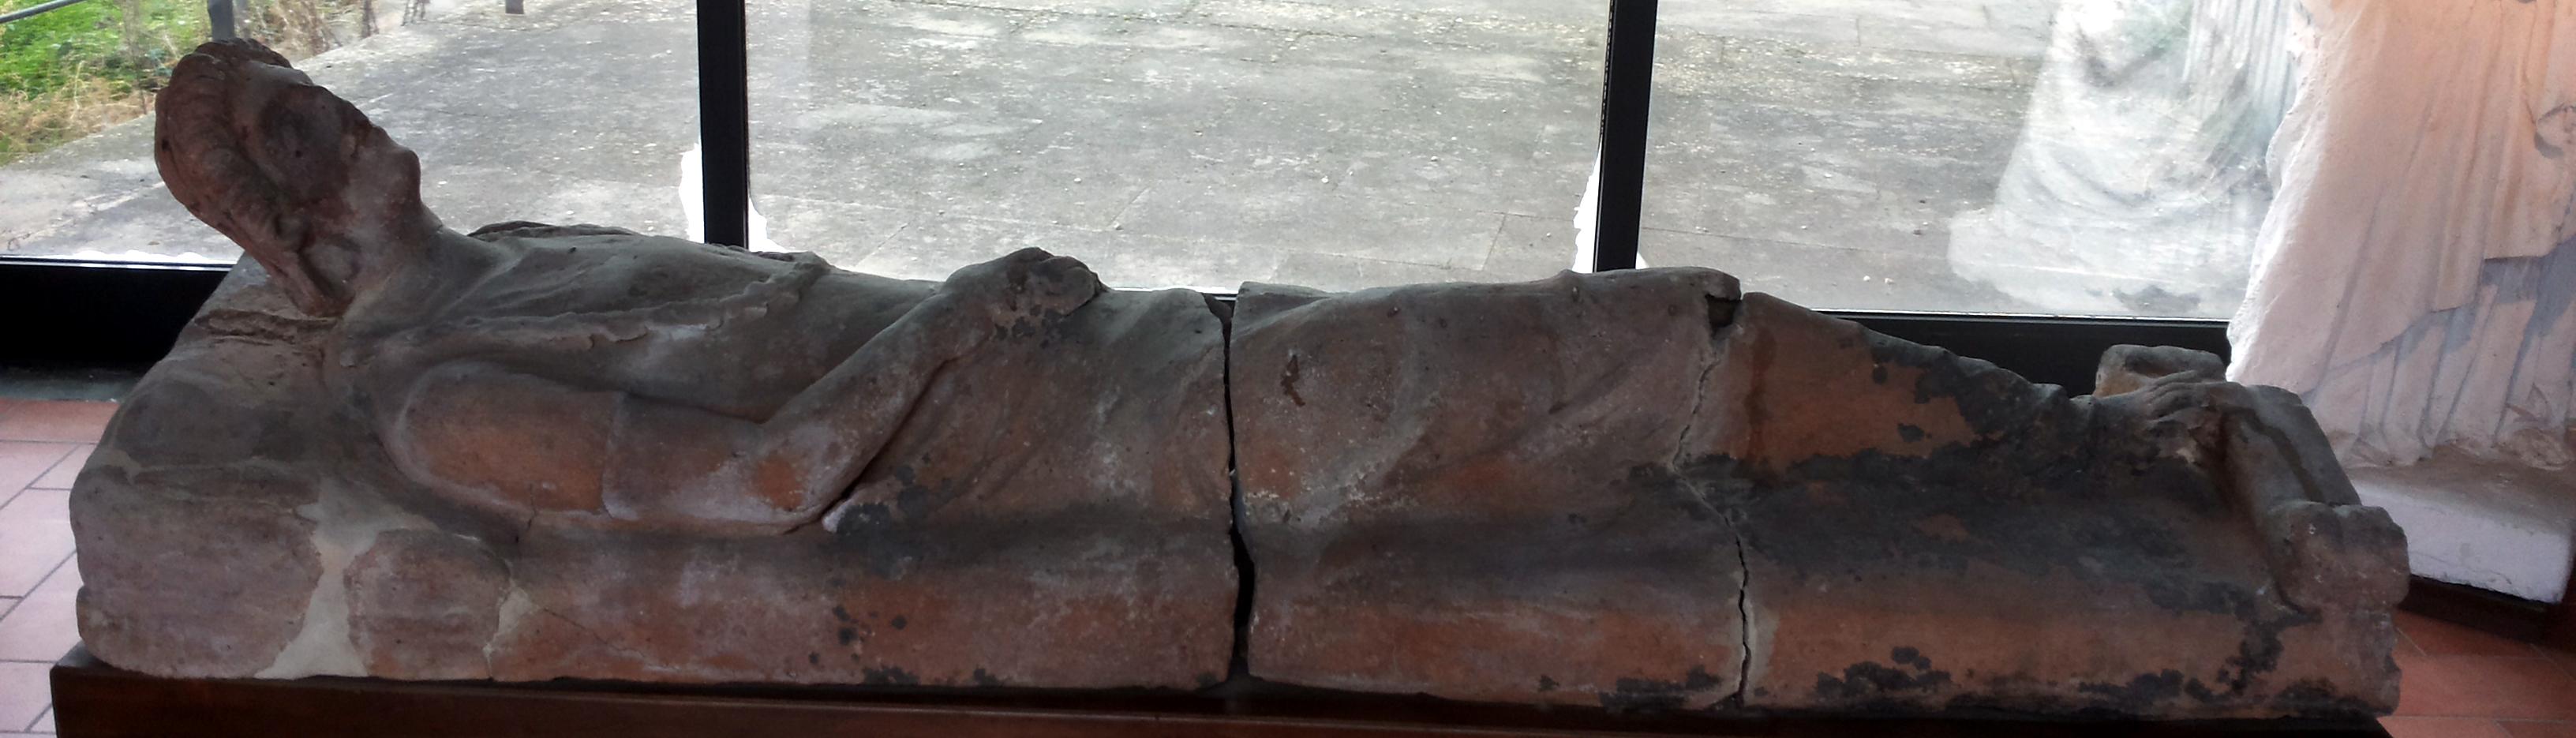 sarcofago etrusco del II secolo a.C.